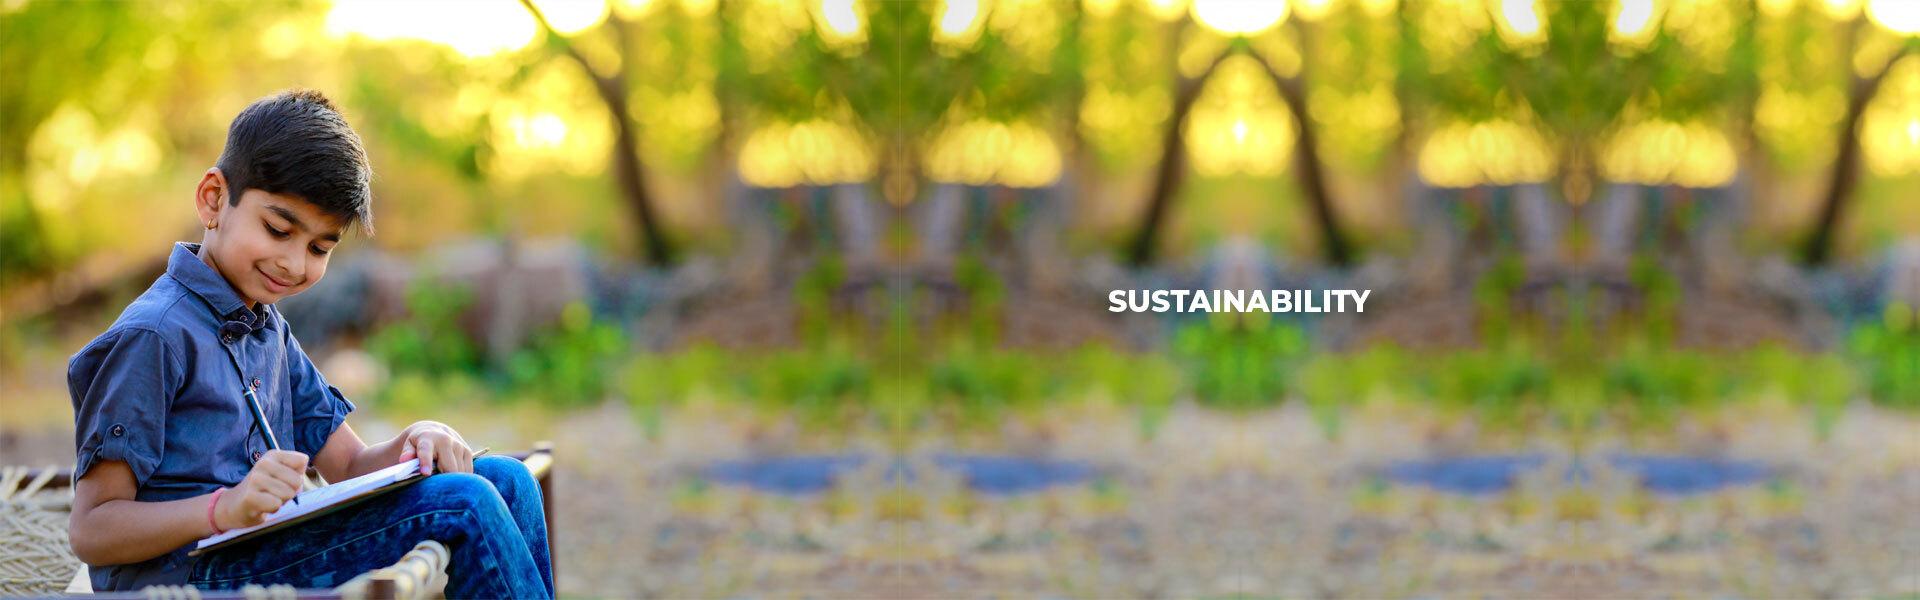 sustainibilityforcolorformereducation